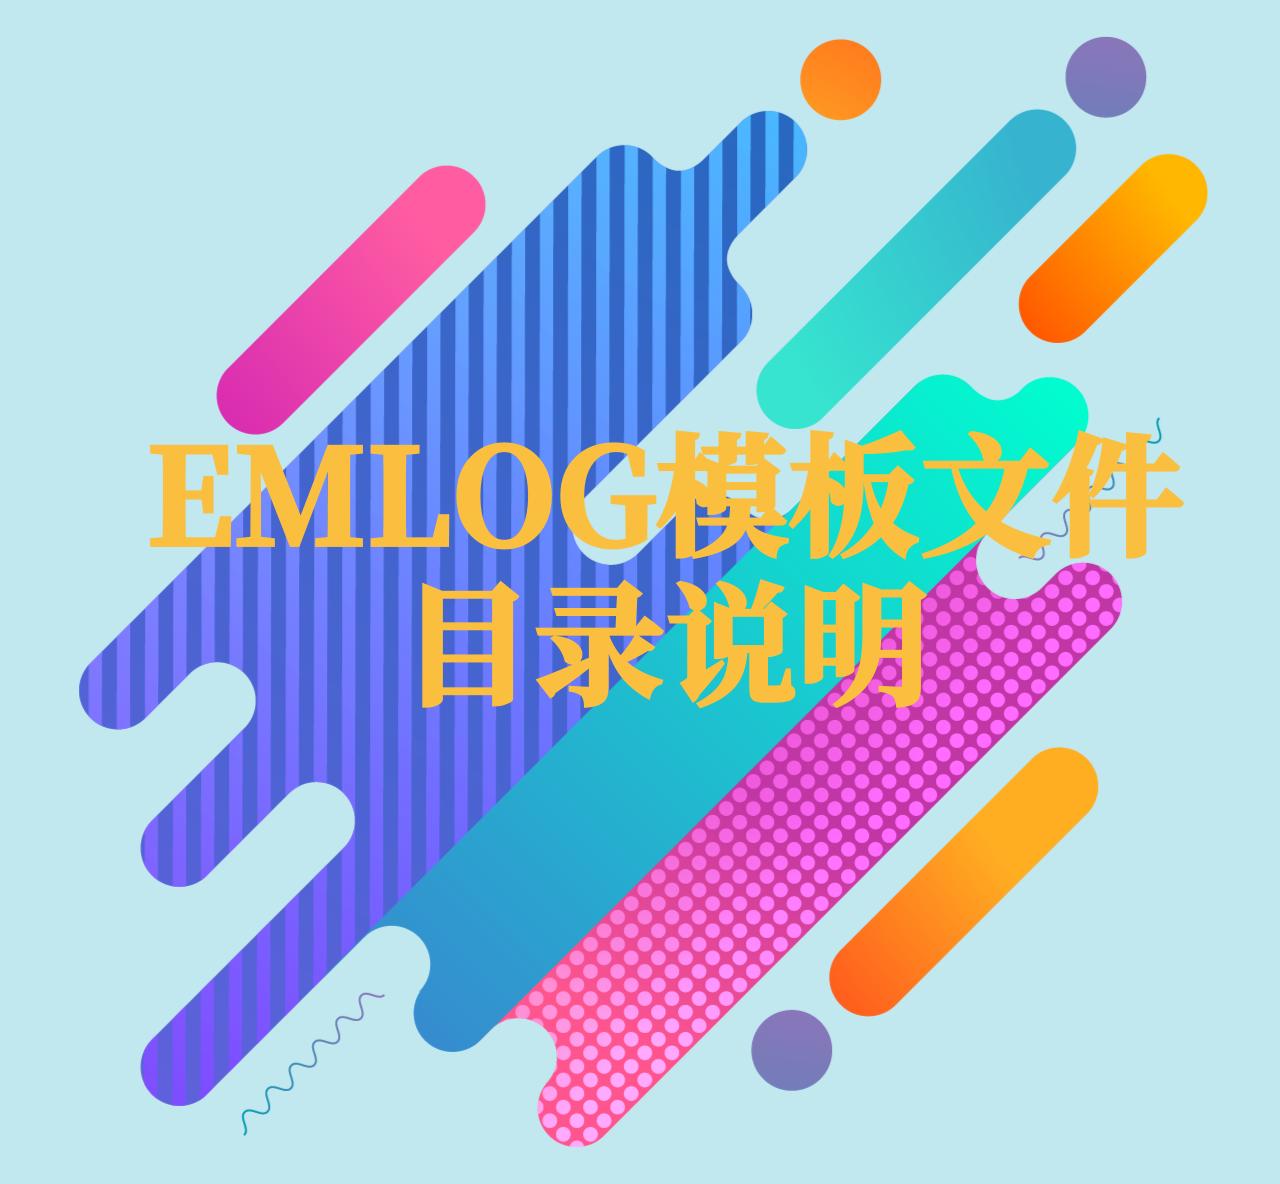 EMLOG模板文件目录说明(一)